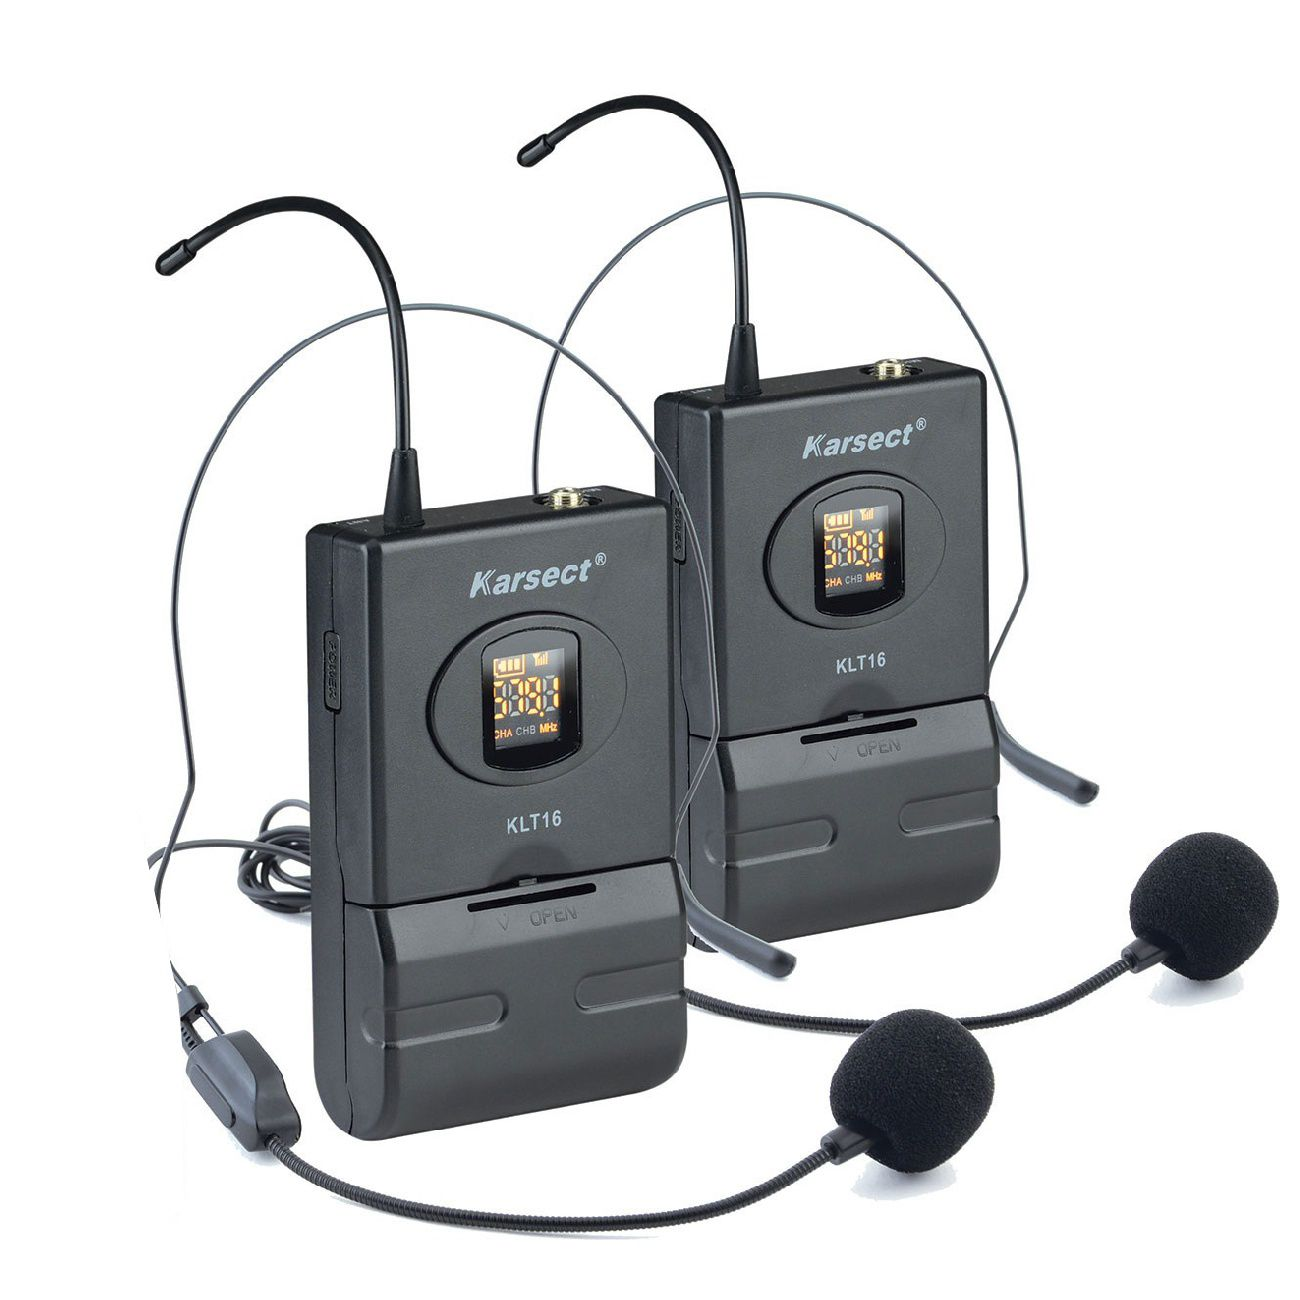 Microfone Karsect Sem Fio Krd200 Dh Uhf Duplo Headset